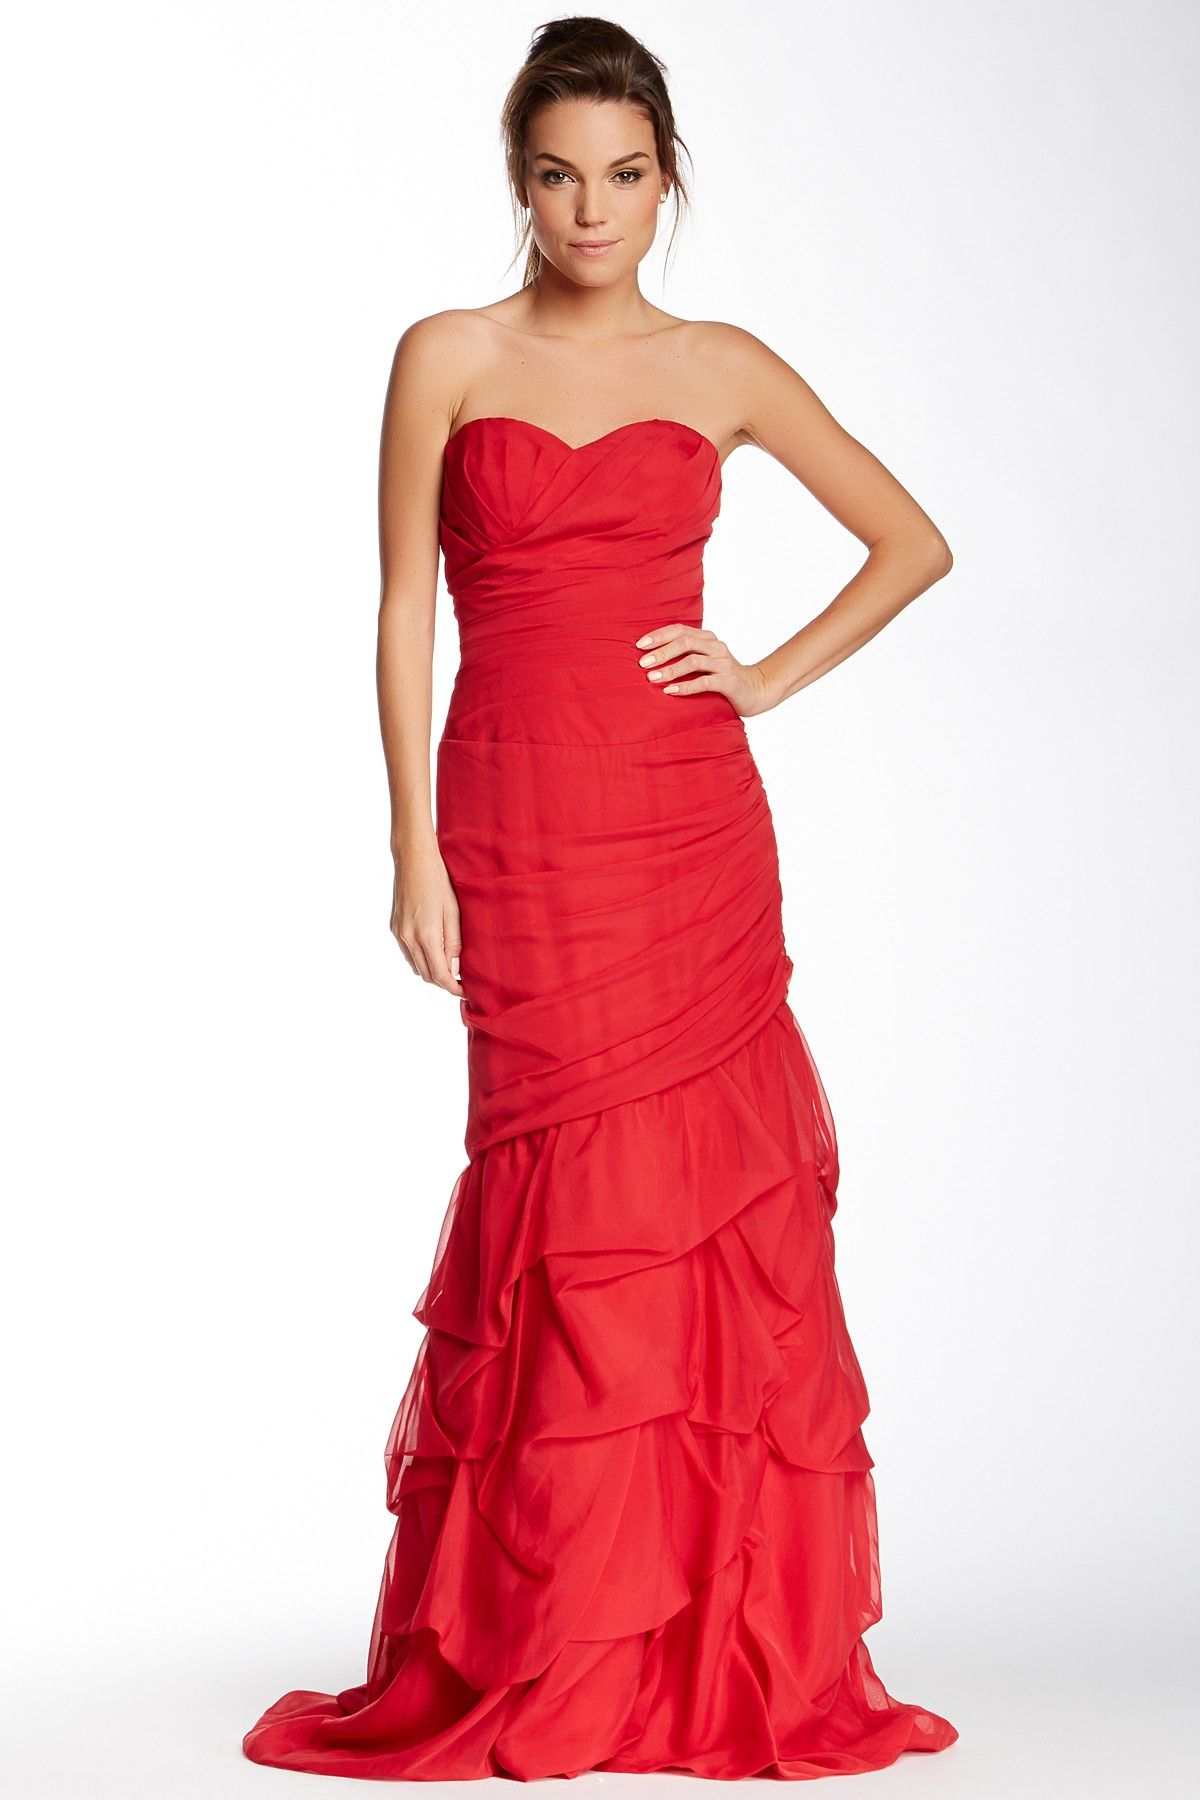 Dalia macphee ruched strapless gown by dalia macphee on hautelook